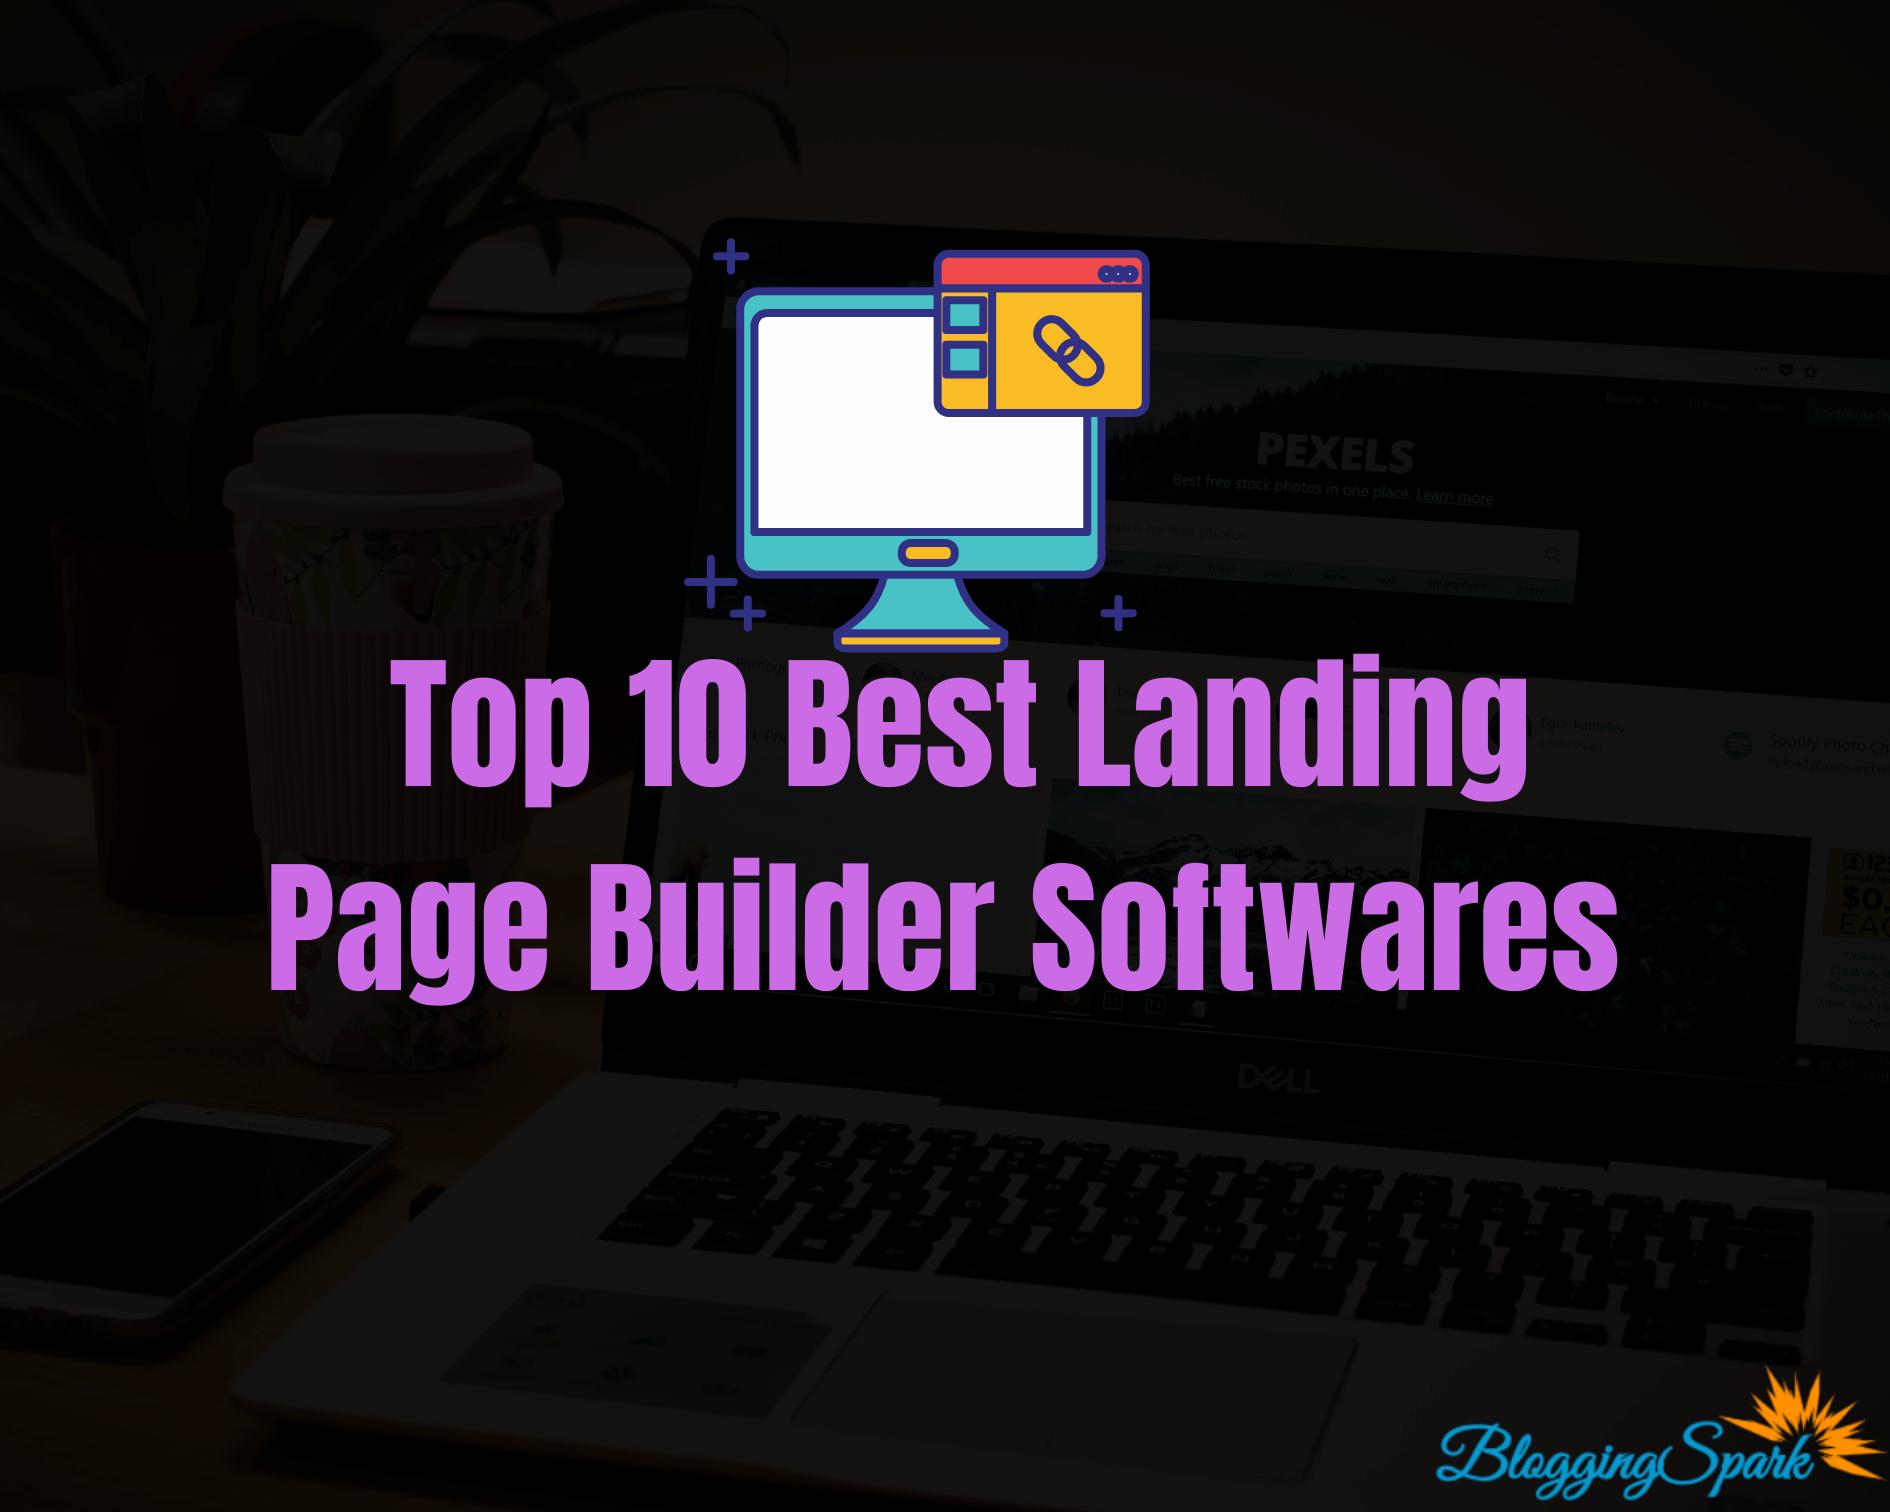 Top 10 Best Landing Page Builder Softwares in 2021